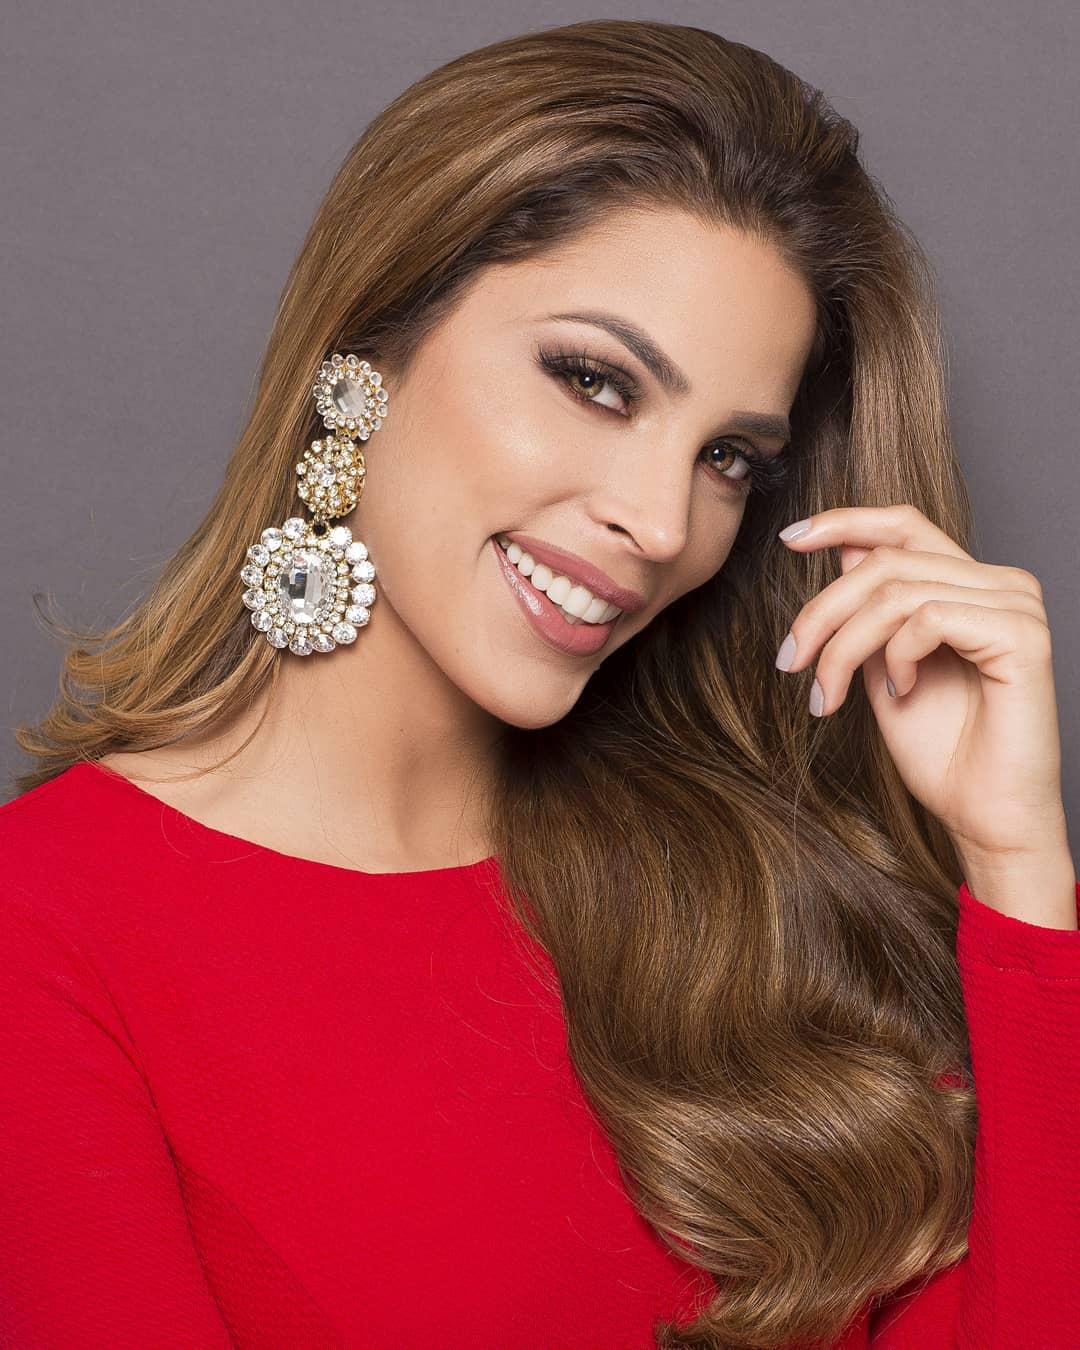 maria jose bracho, miss venezuela continentes unidos 2019. - Página 2 67413711